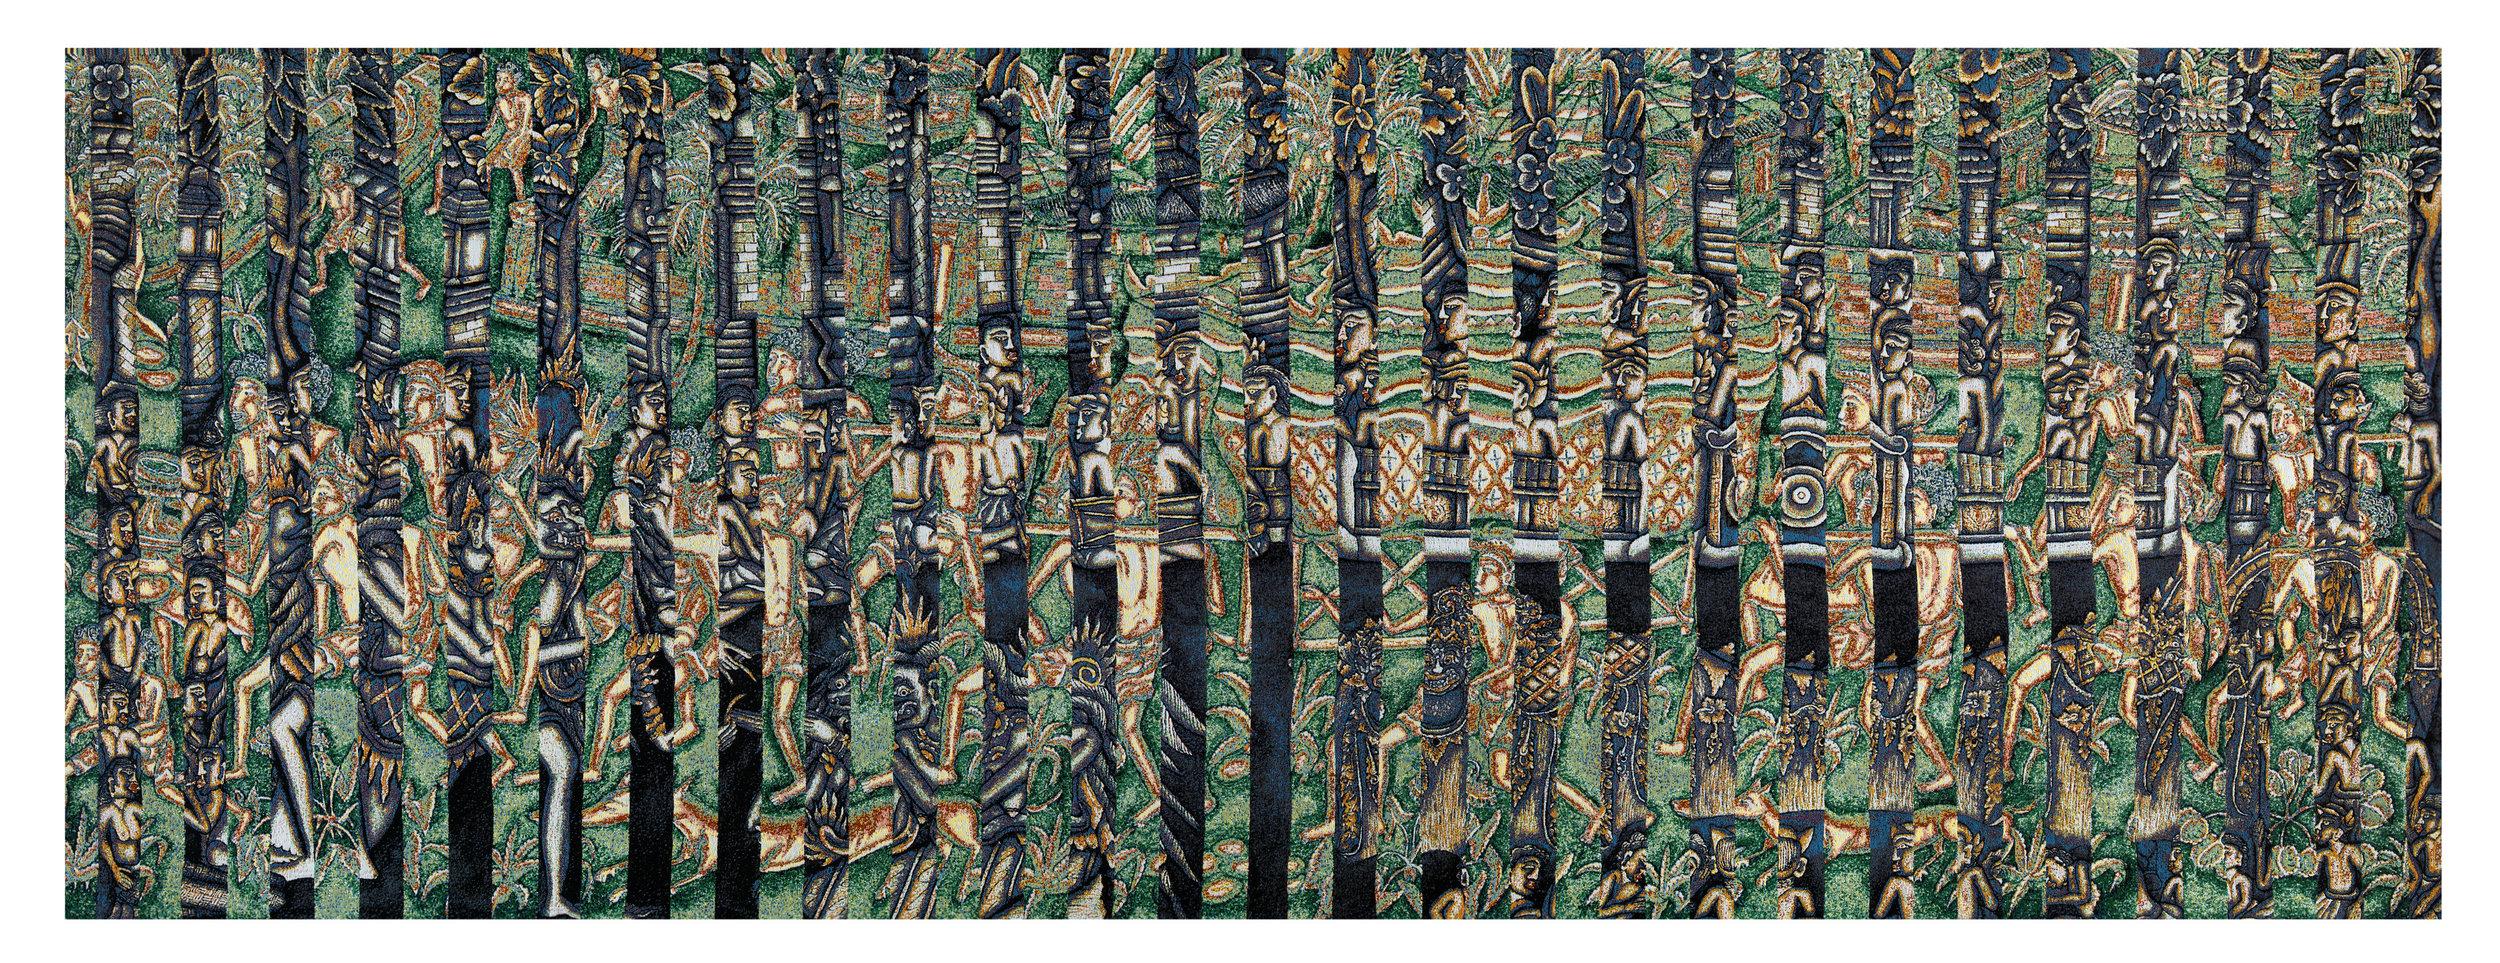 Batuan 1, jacquard woven, 142 x 382 cm